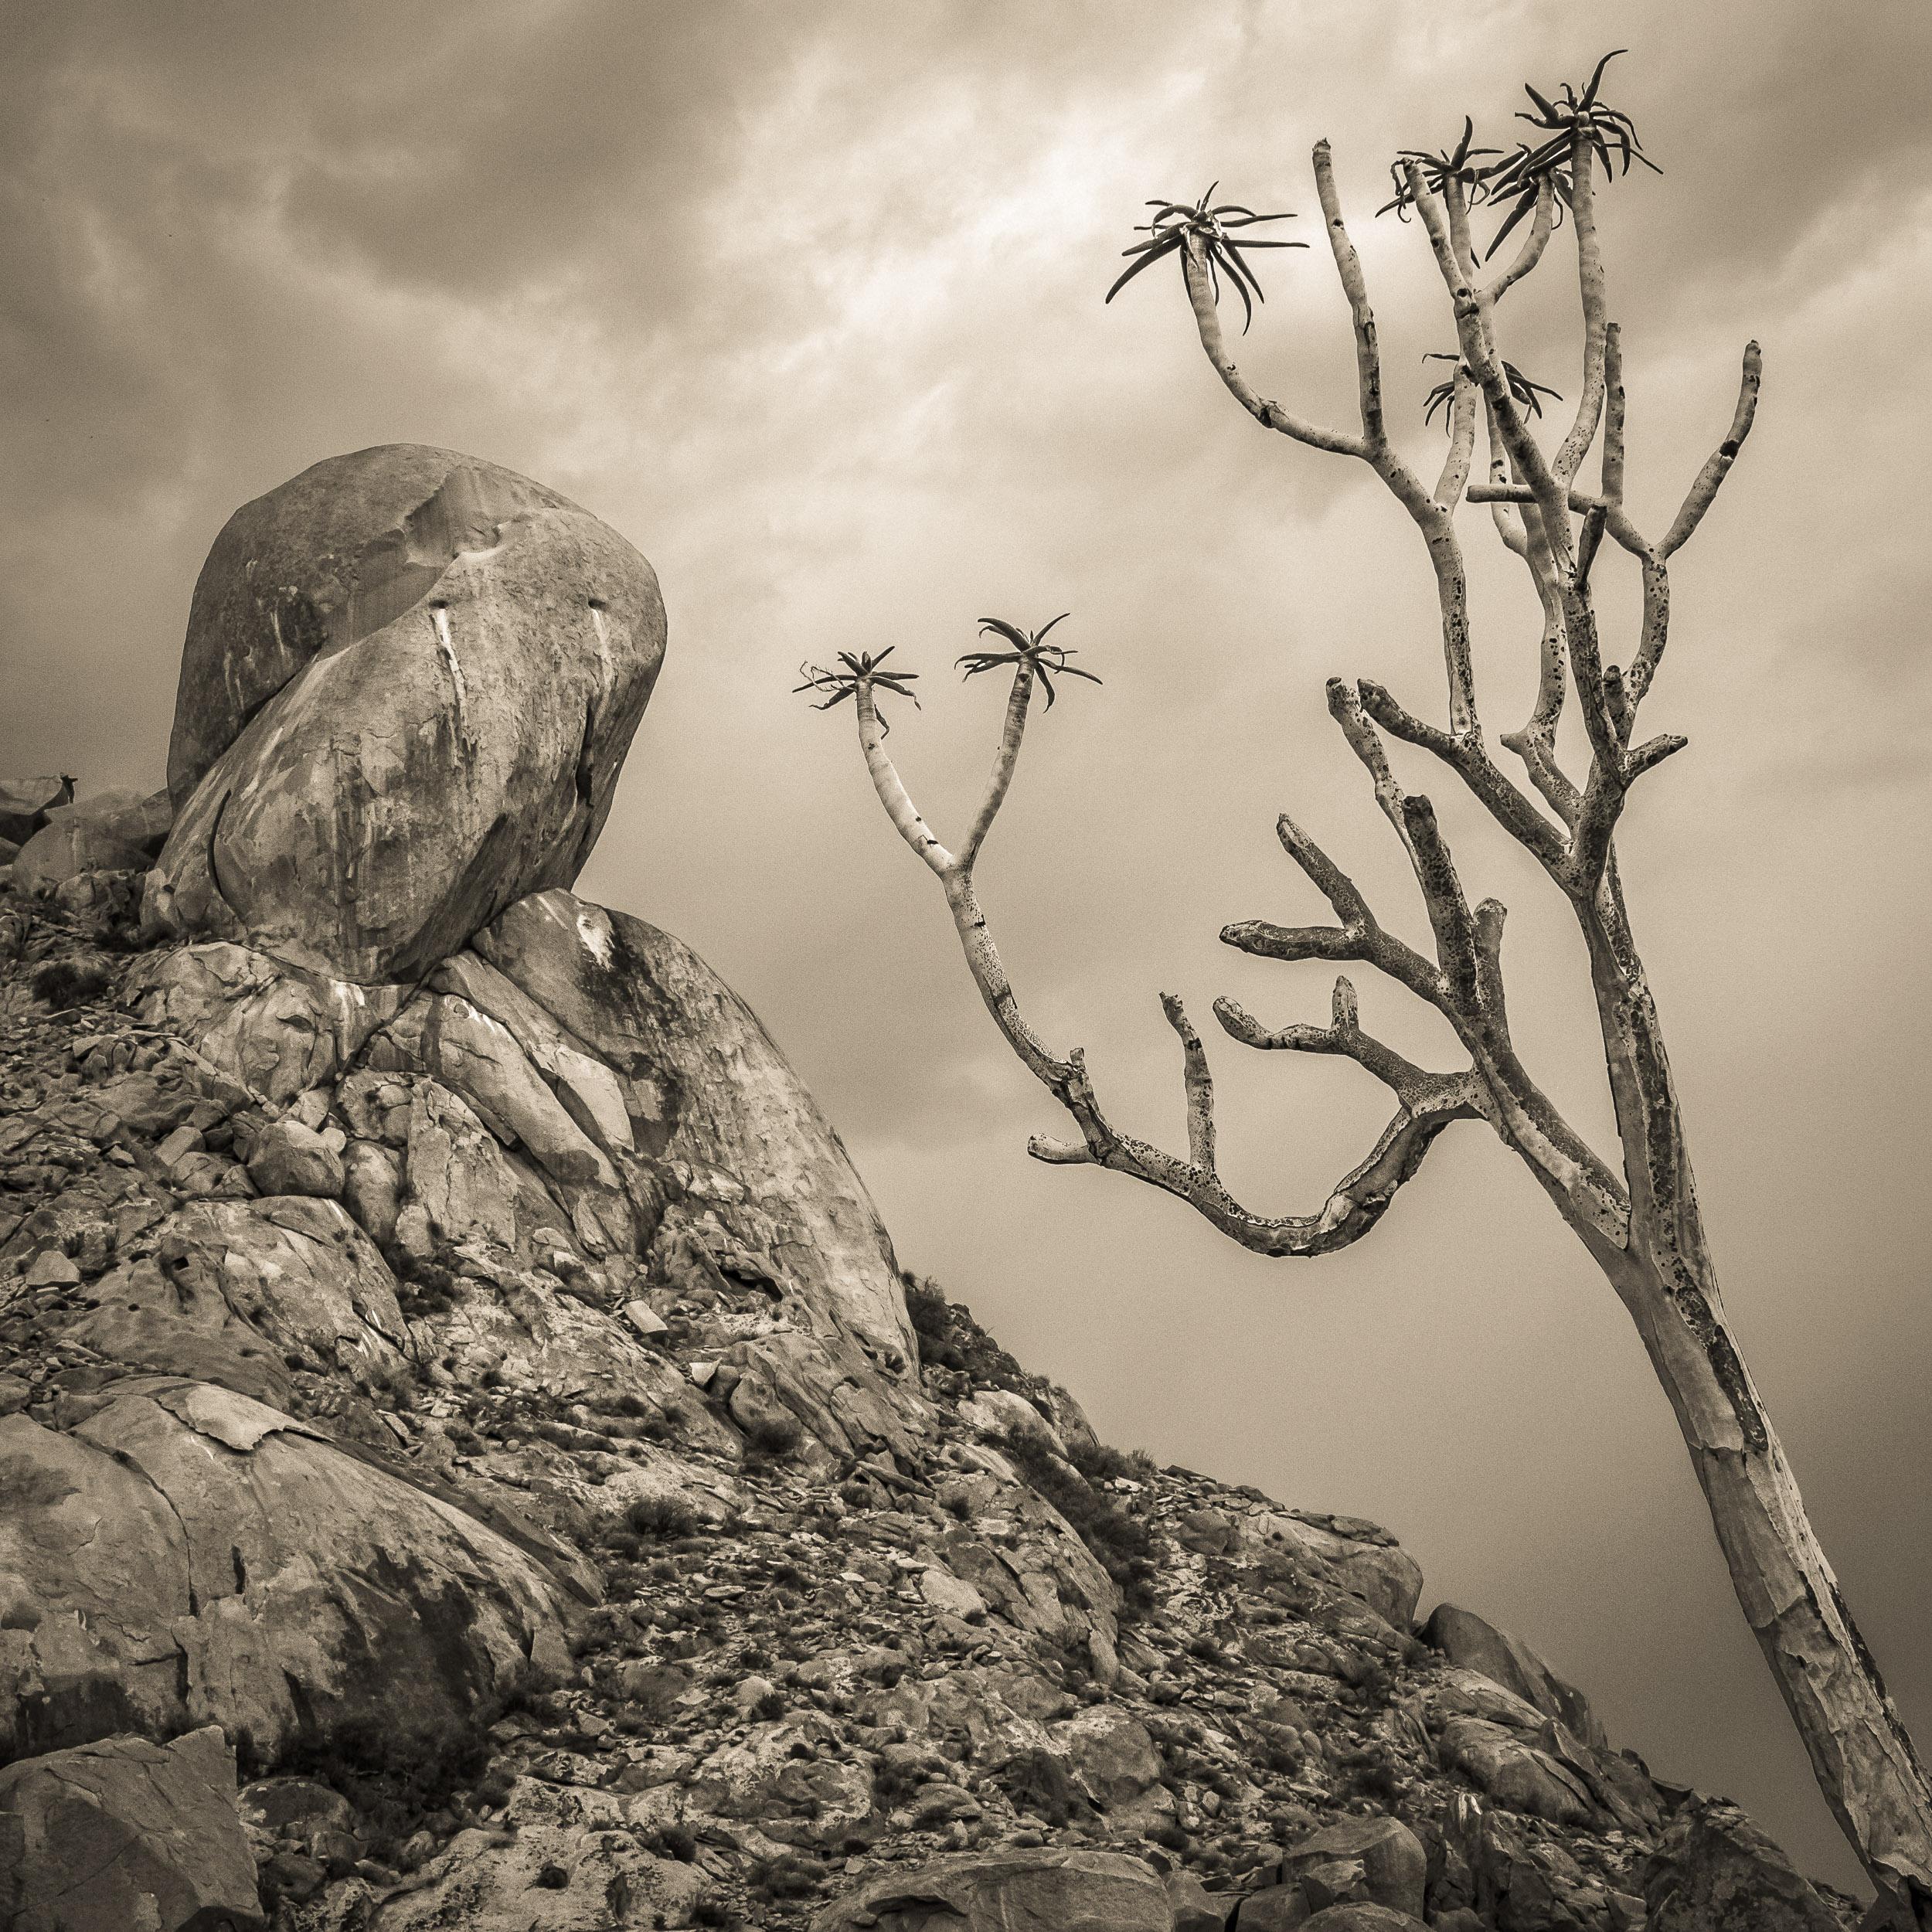 The Toe, Richtersveld, South Africa, Copyright © Len Metcalf